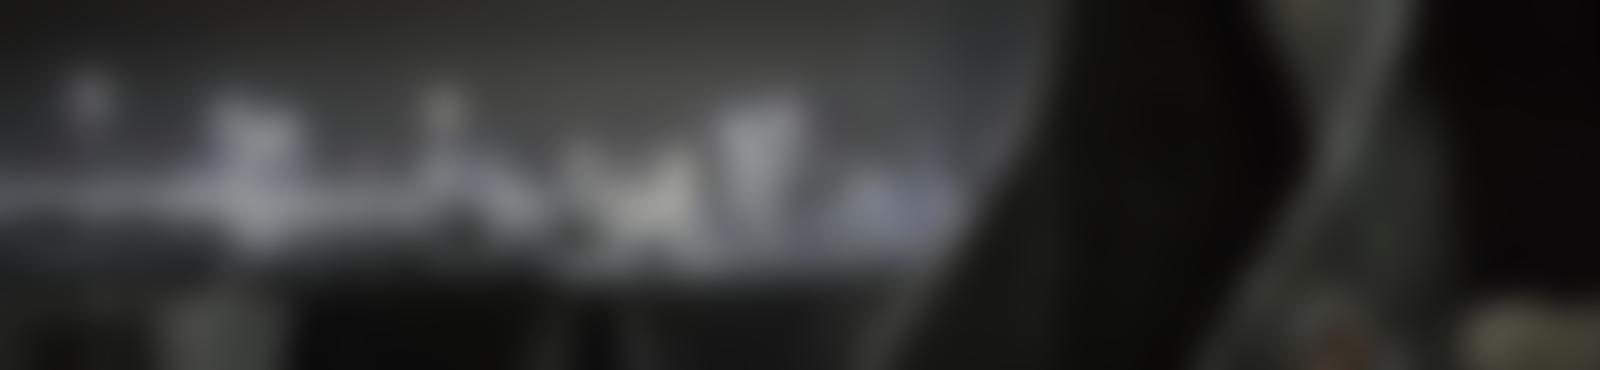 Blurred ff4fe18f 4e02 4b41 90b9 8d9ae4a35607